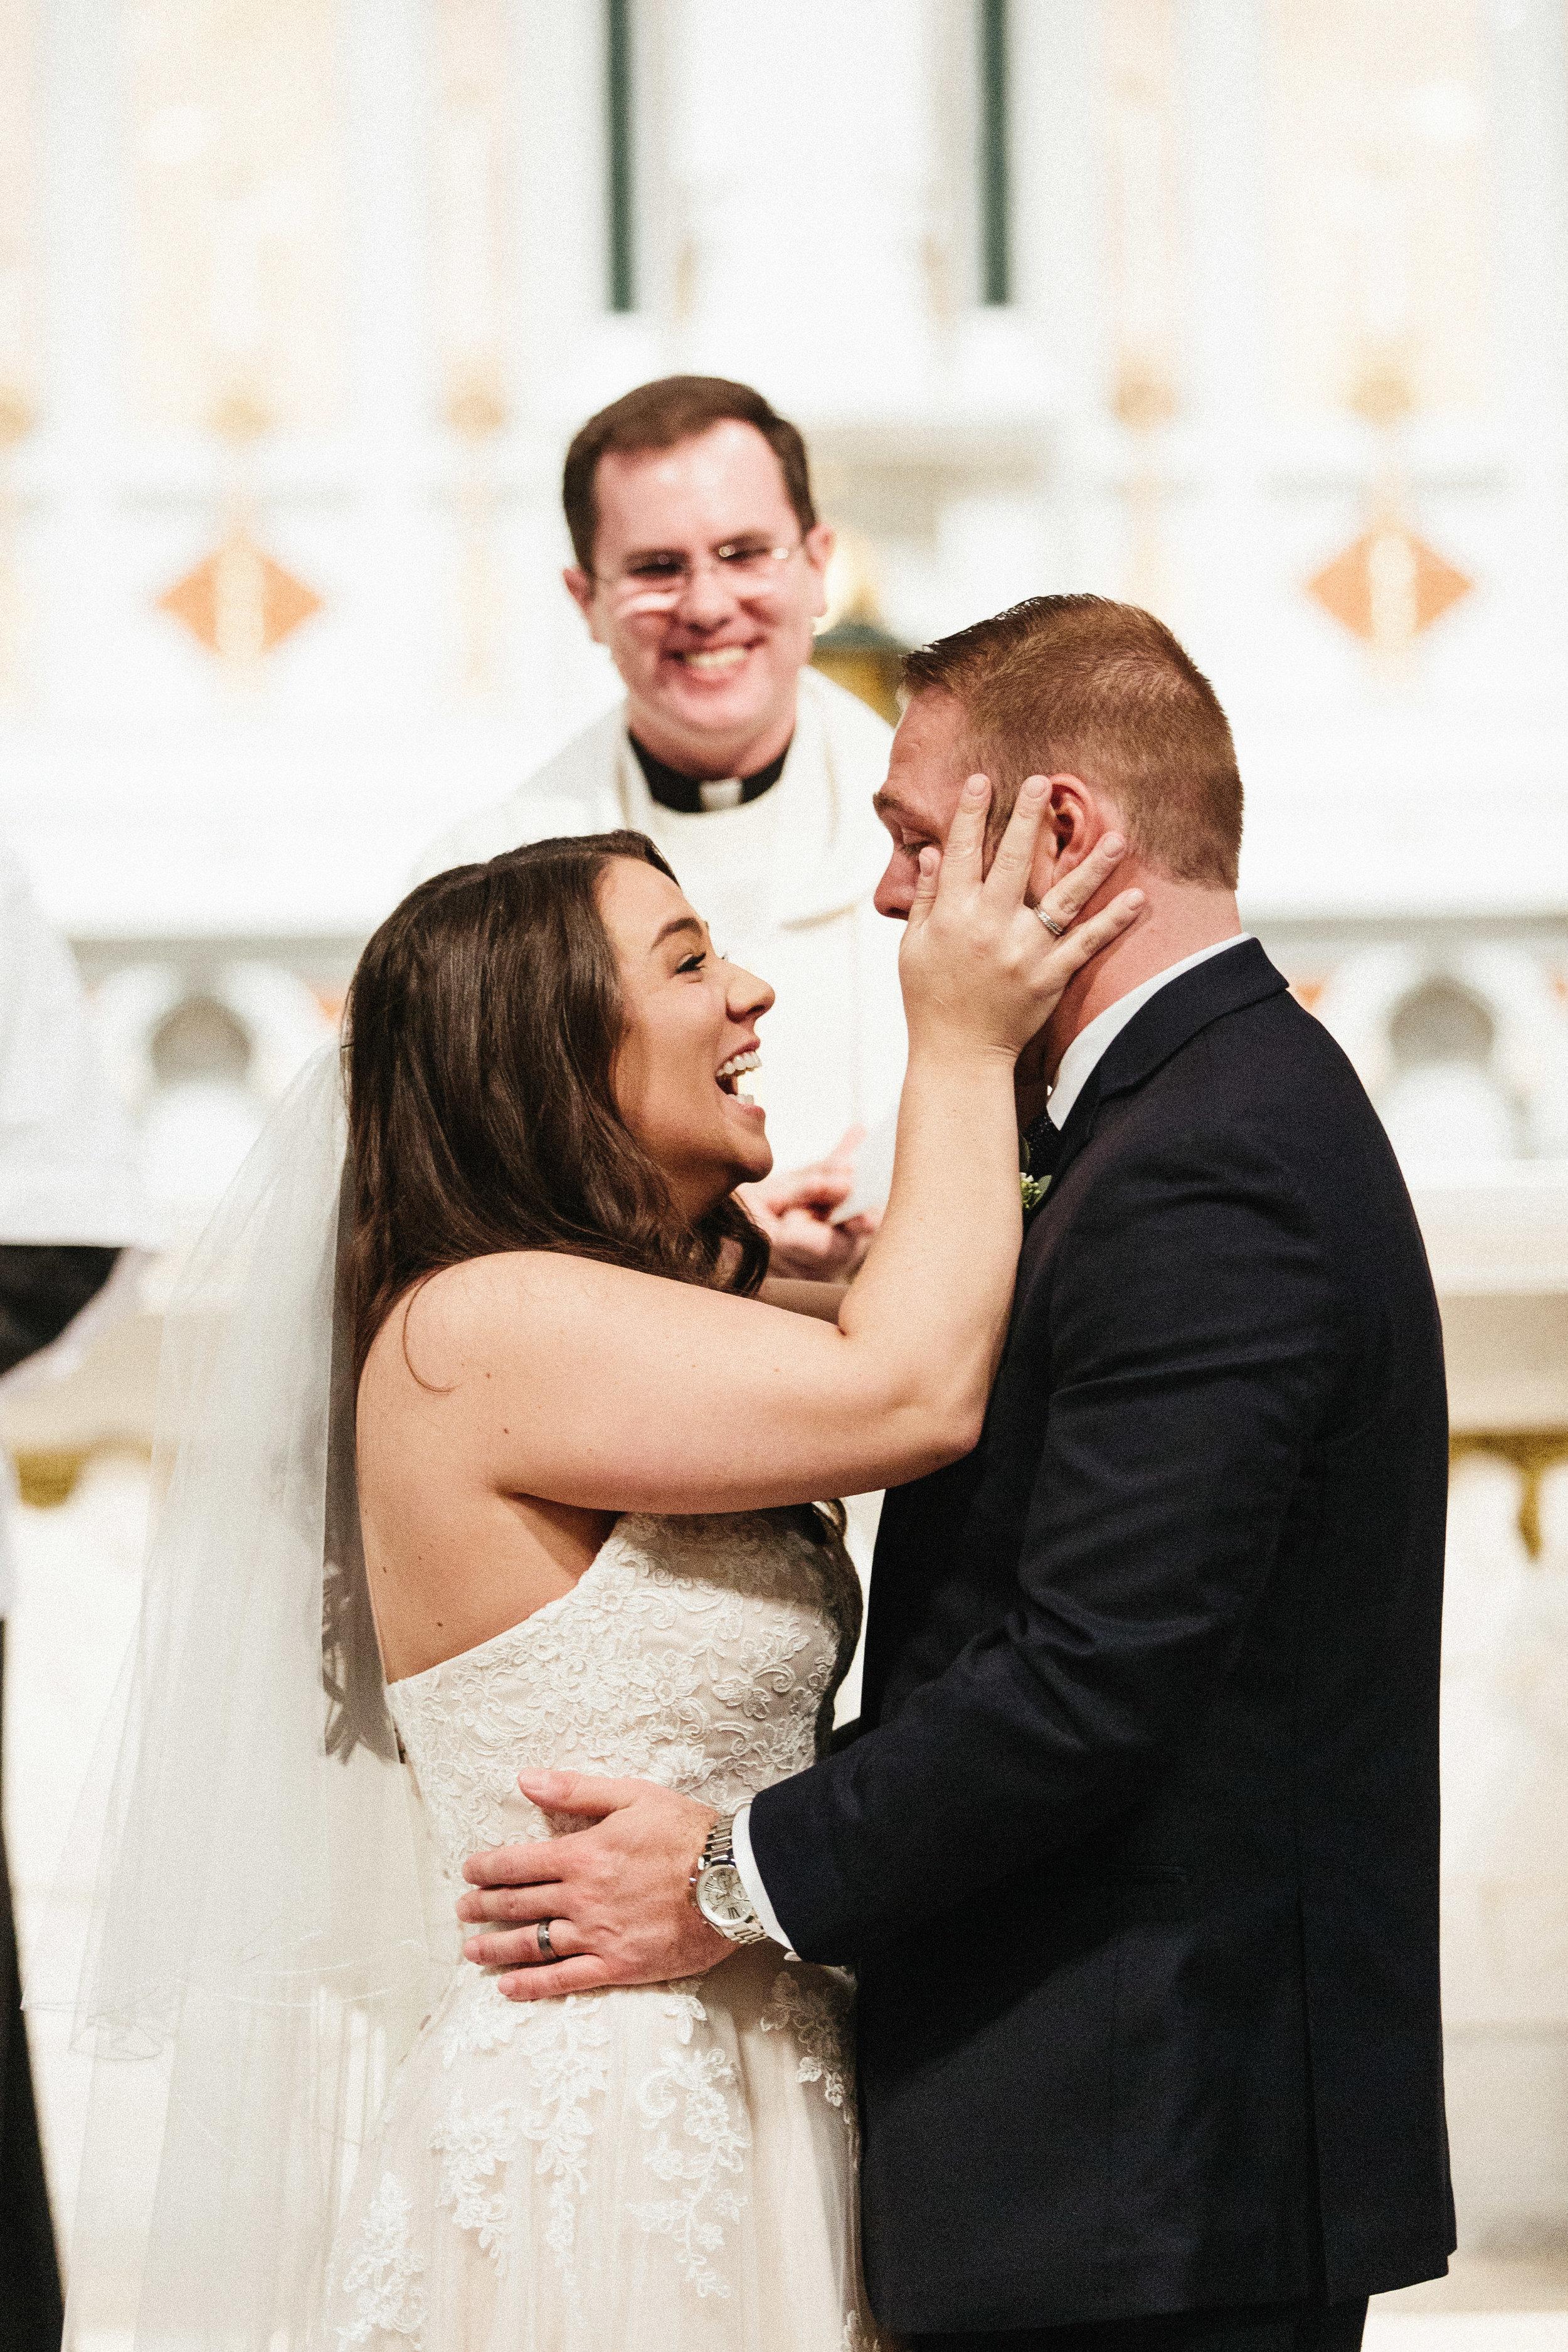 roswell_st_peter_chanel_catholic_avalon_hotel_alpharetta_wedding-1543.jpg